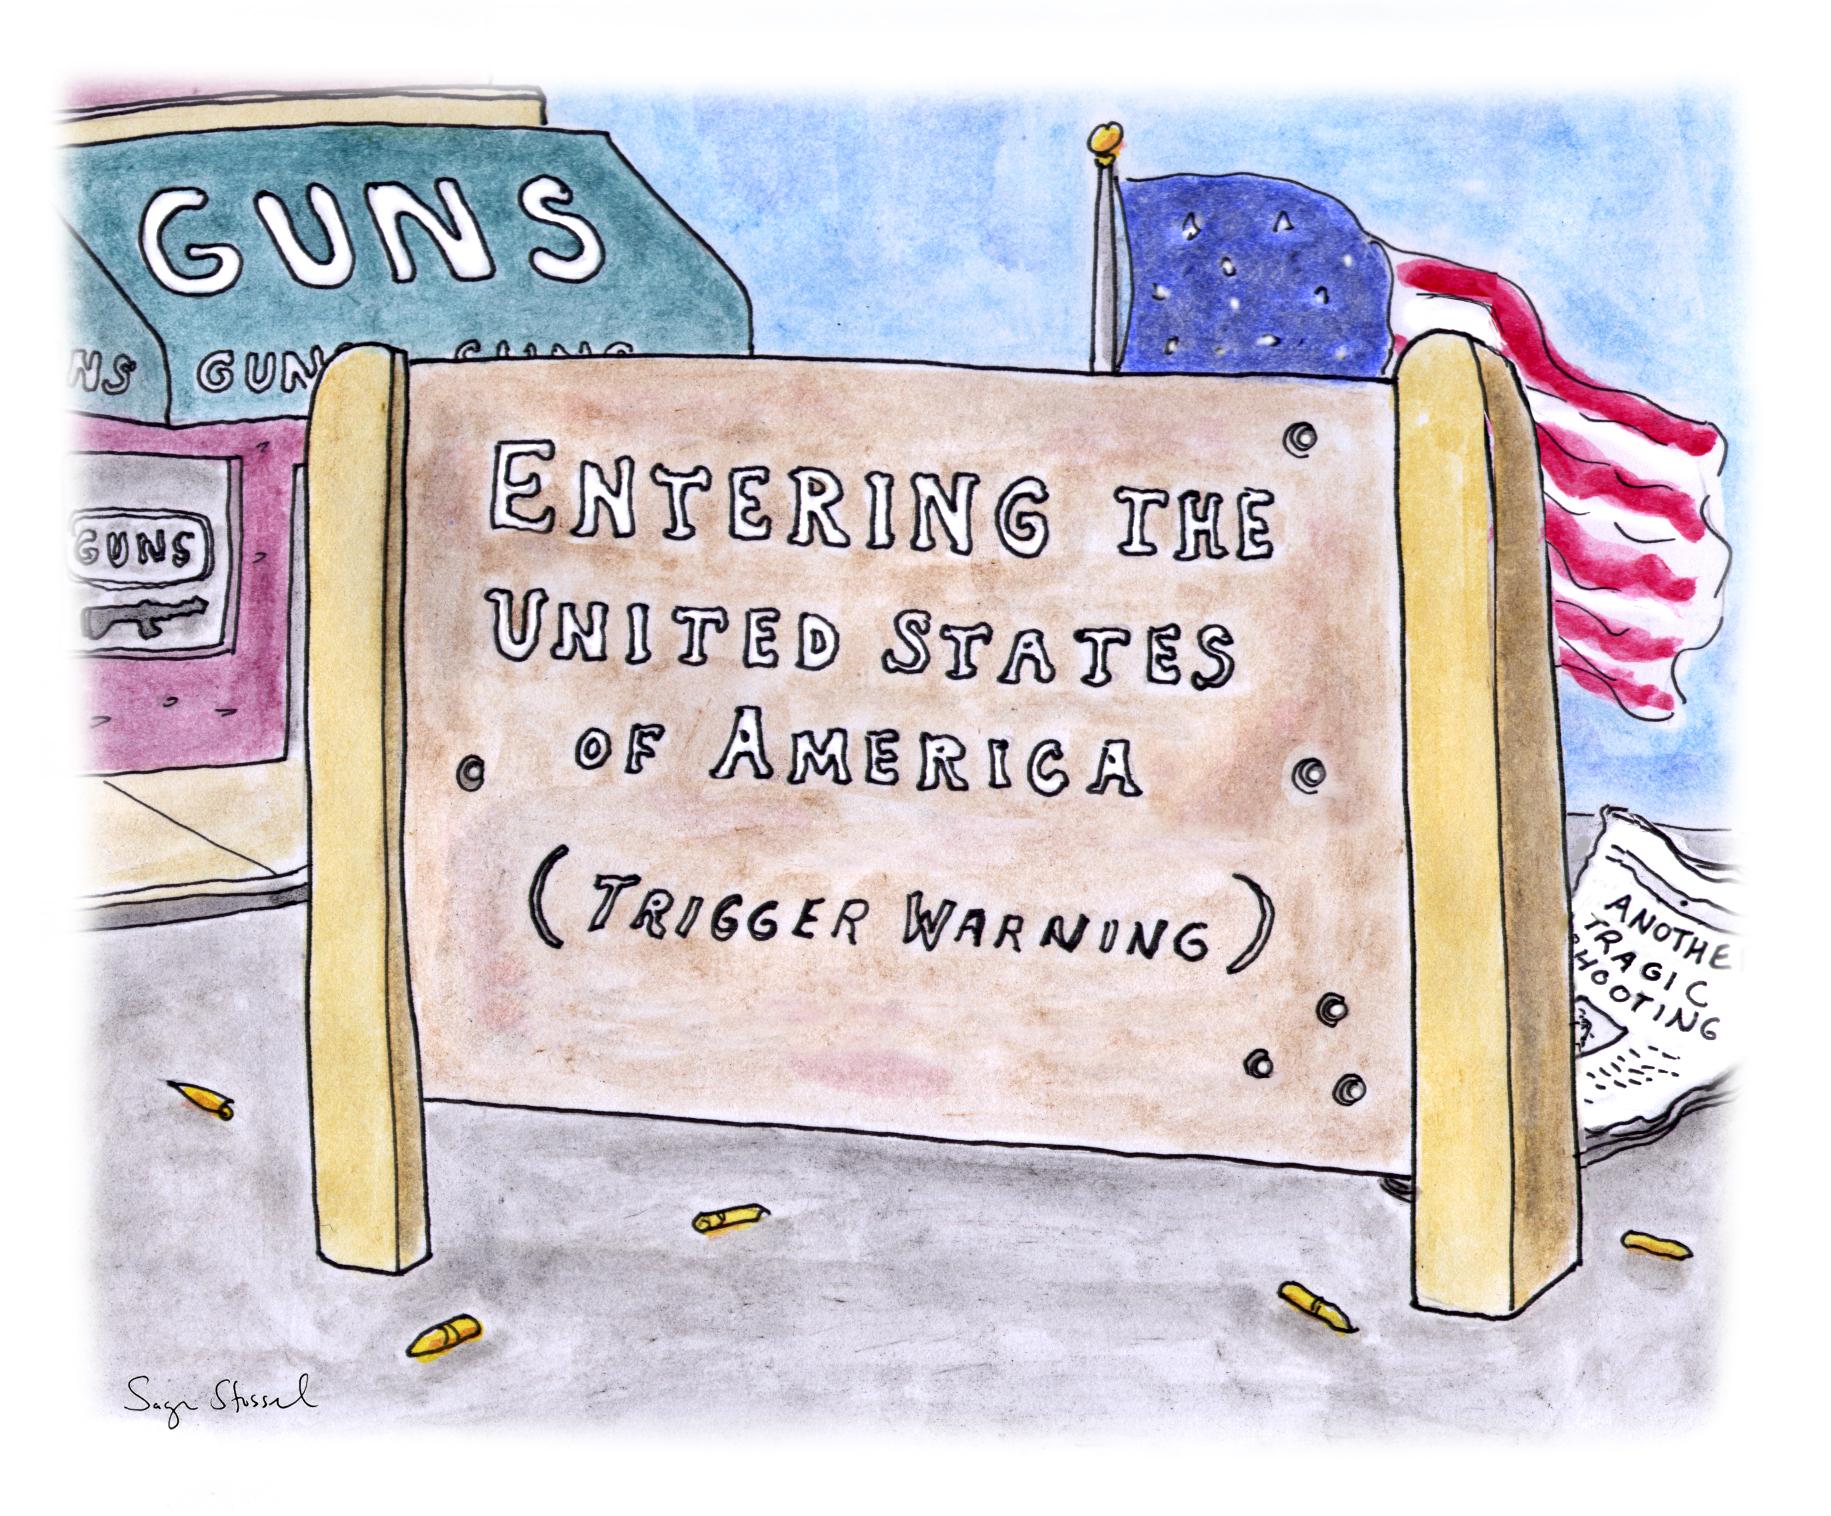 roanoke shooting, gun violence, bryce williams, vester flanagan, charleston church shooting, dylan roof, columbine, newtowne, sandy hook, second amendment, gun laws, movie theater shootings, NRA, gun lobby, cartoon